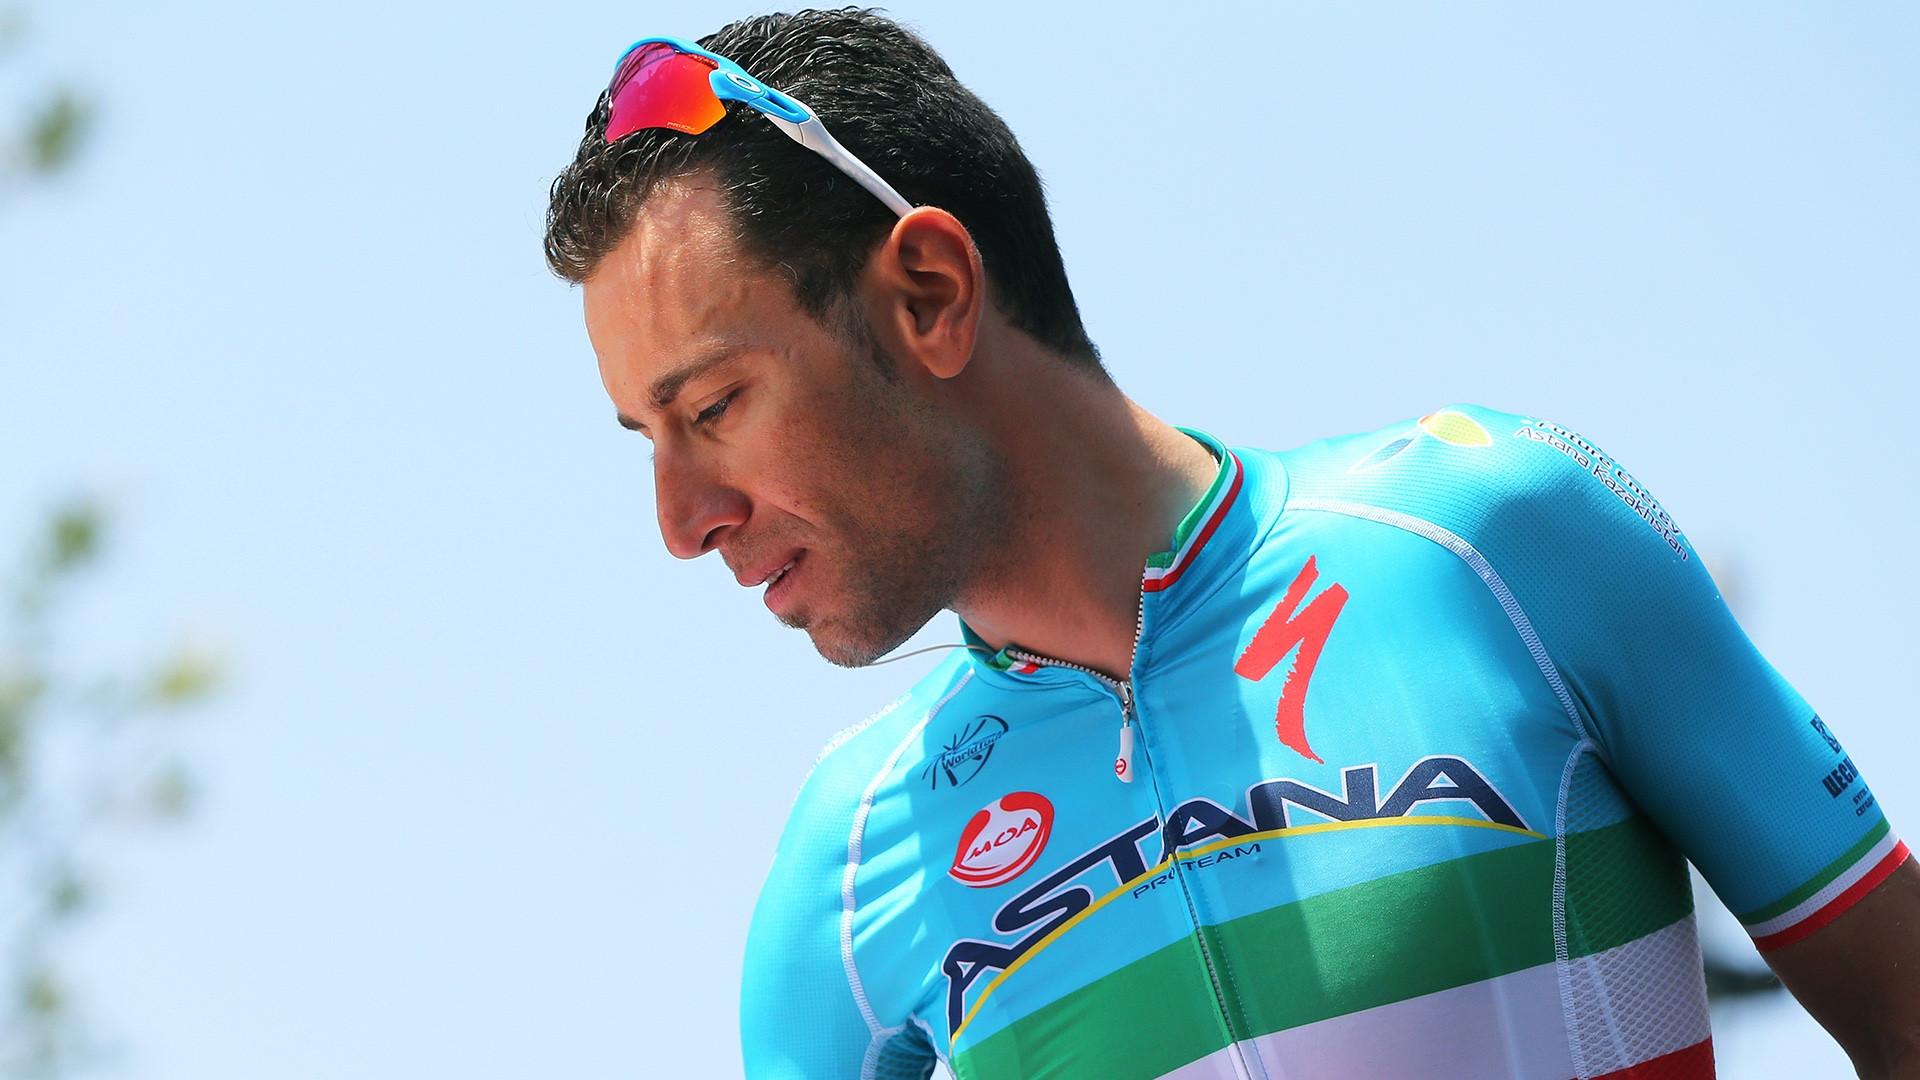 Винченцо Нибали возвращается в велокоманду «Астана»